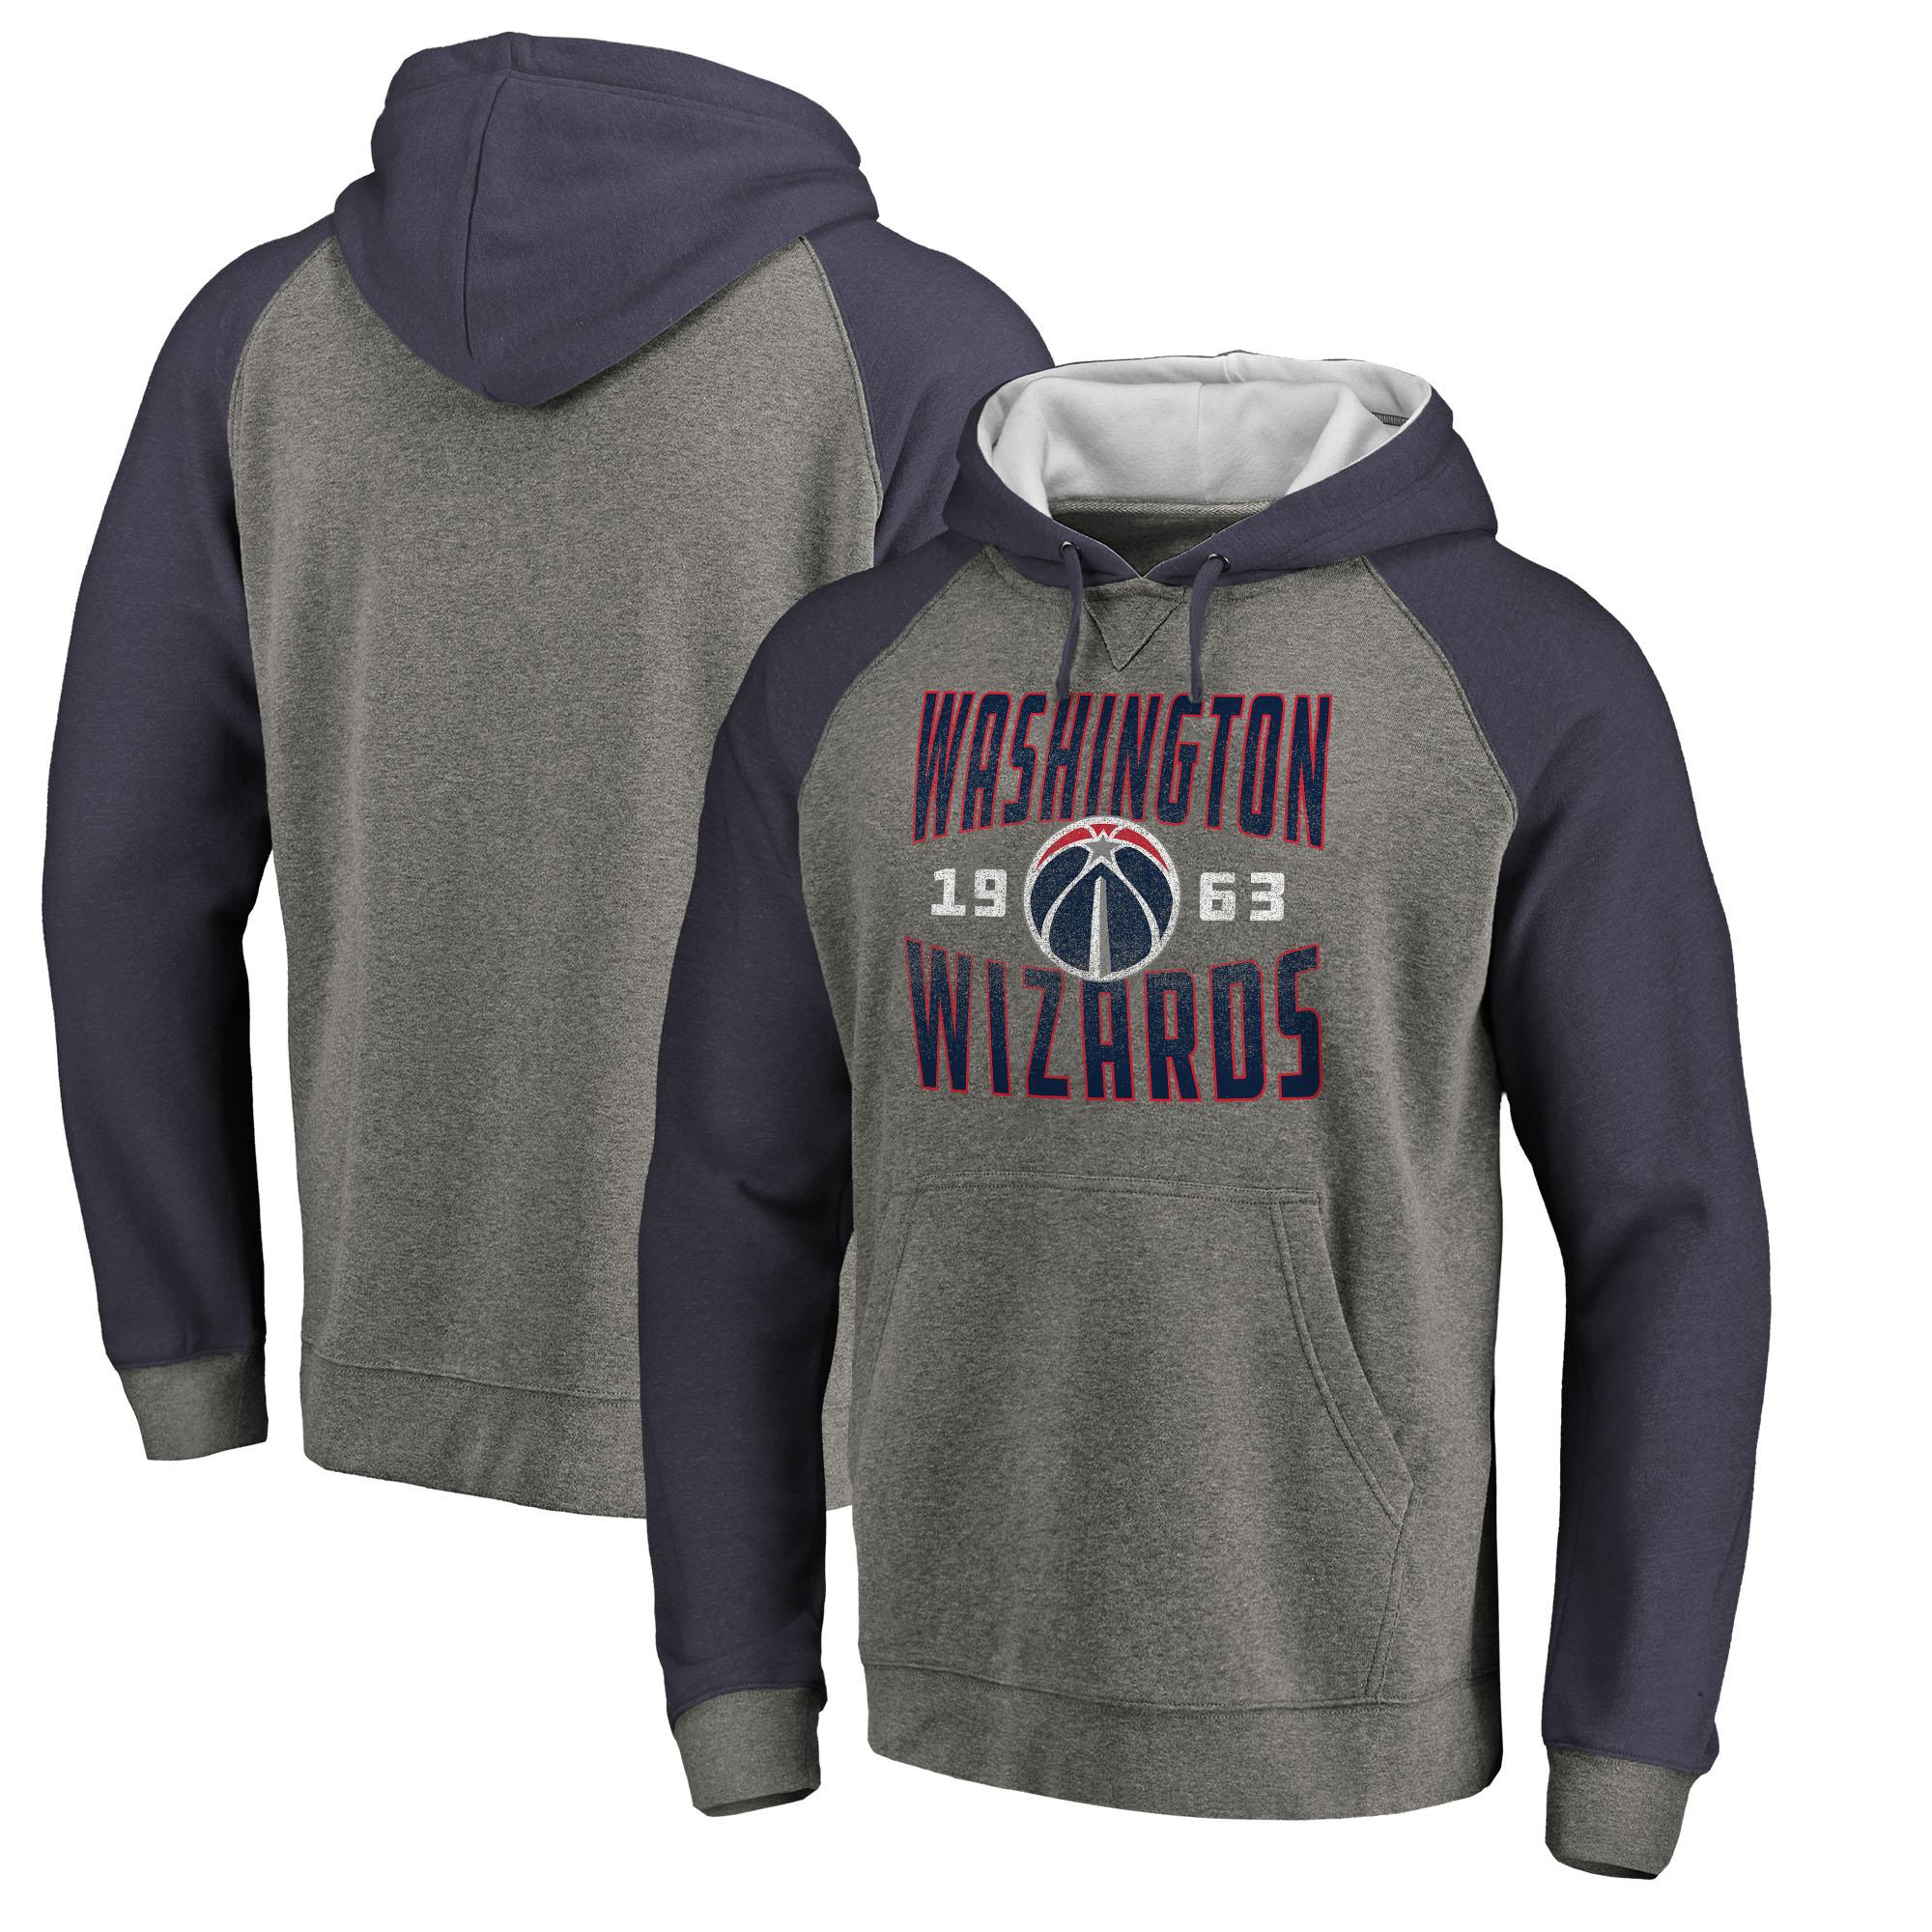 Washington Wizards Fanatics Branded Ash Antique Stack Tri-Blend Raglan Pullover Hoodie